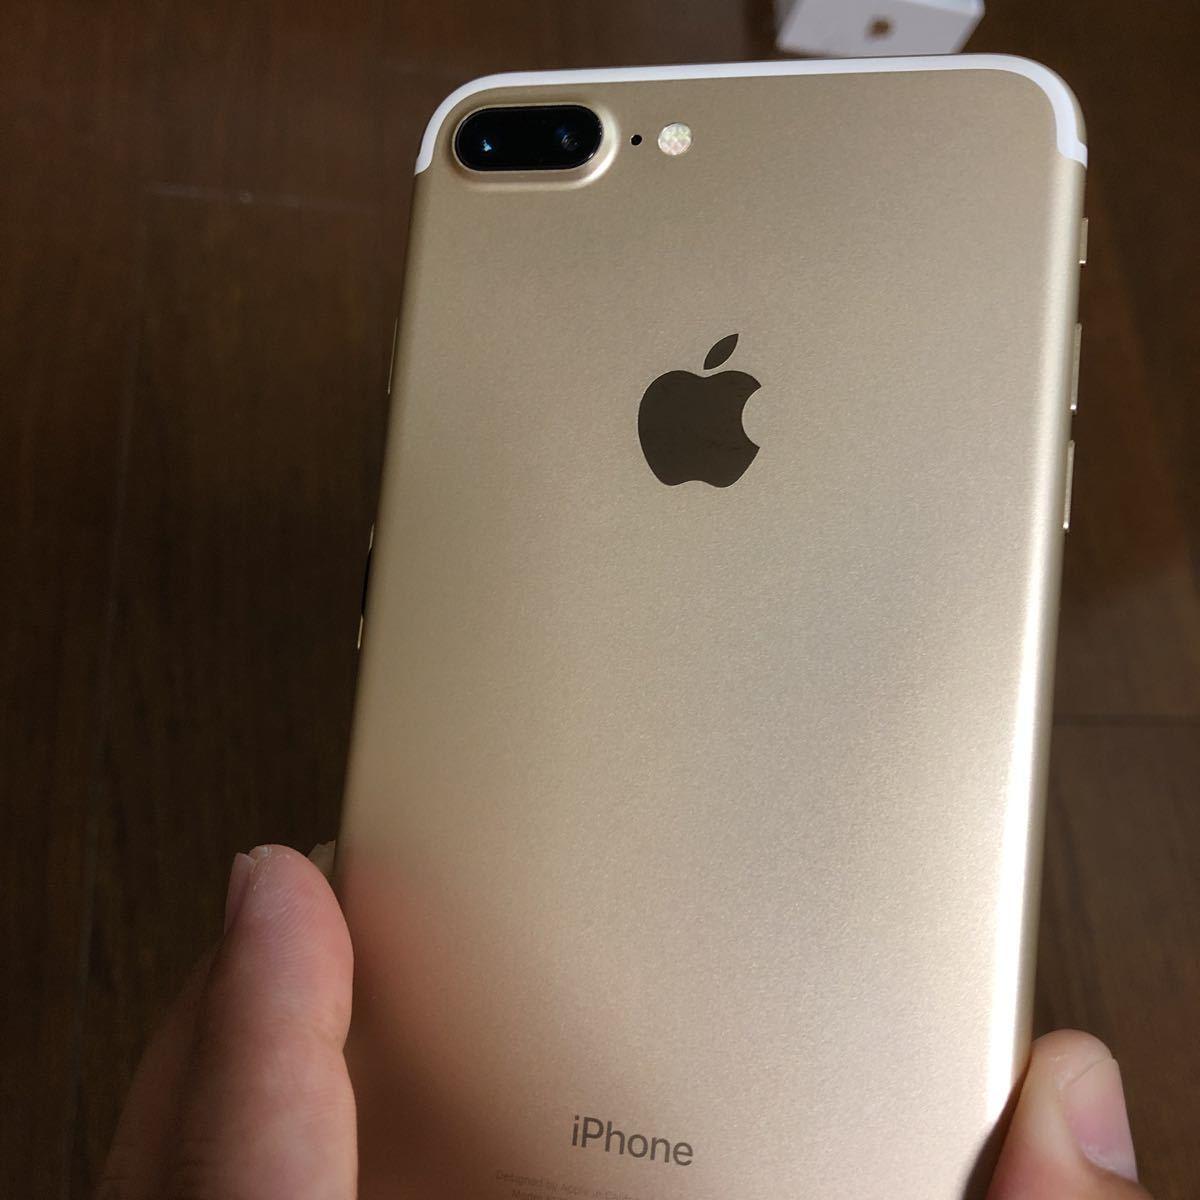 iPhone7 Plus GOLD 256GB ドコモ版 SIMロック解除済み_画像6